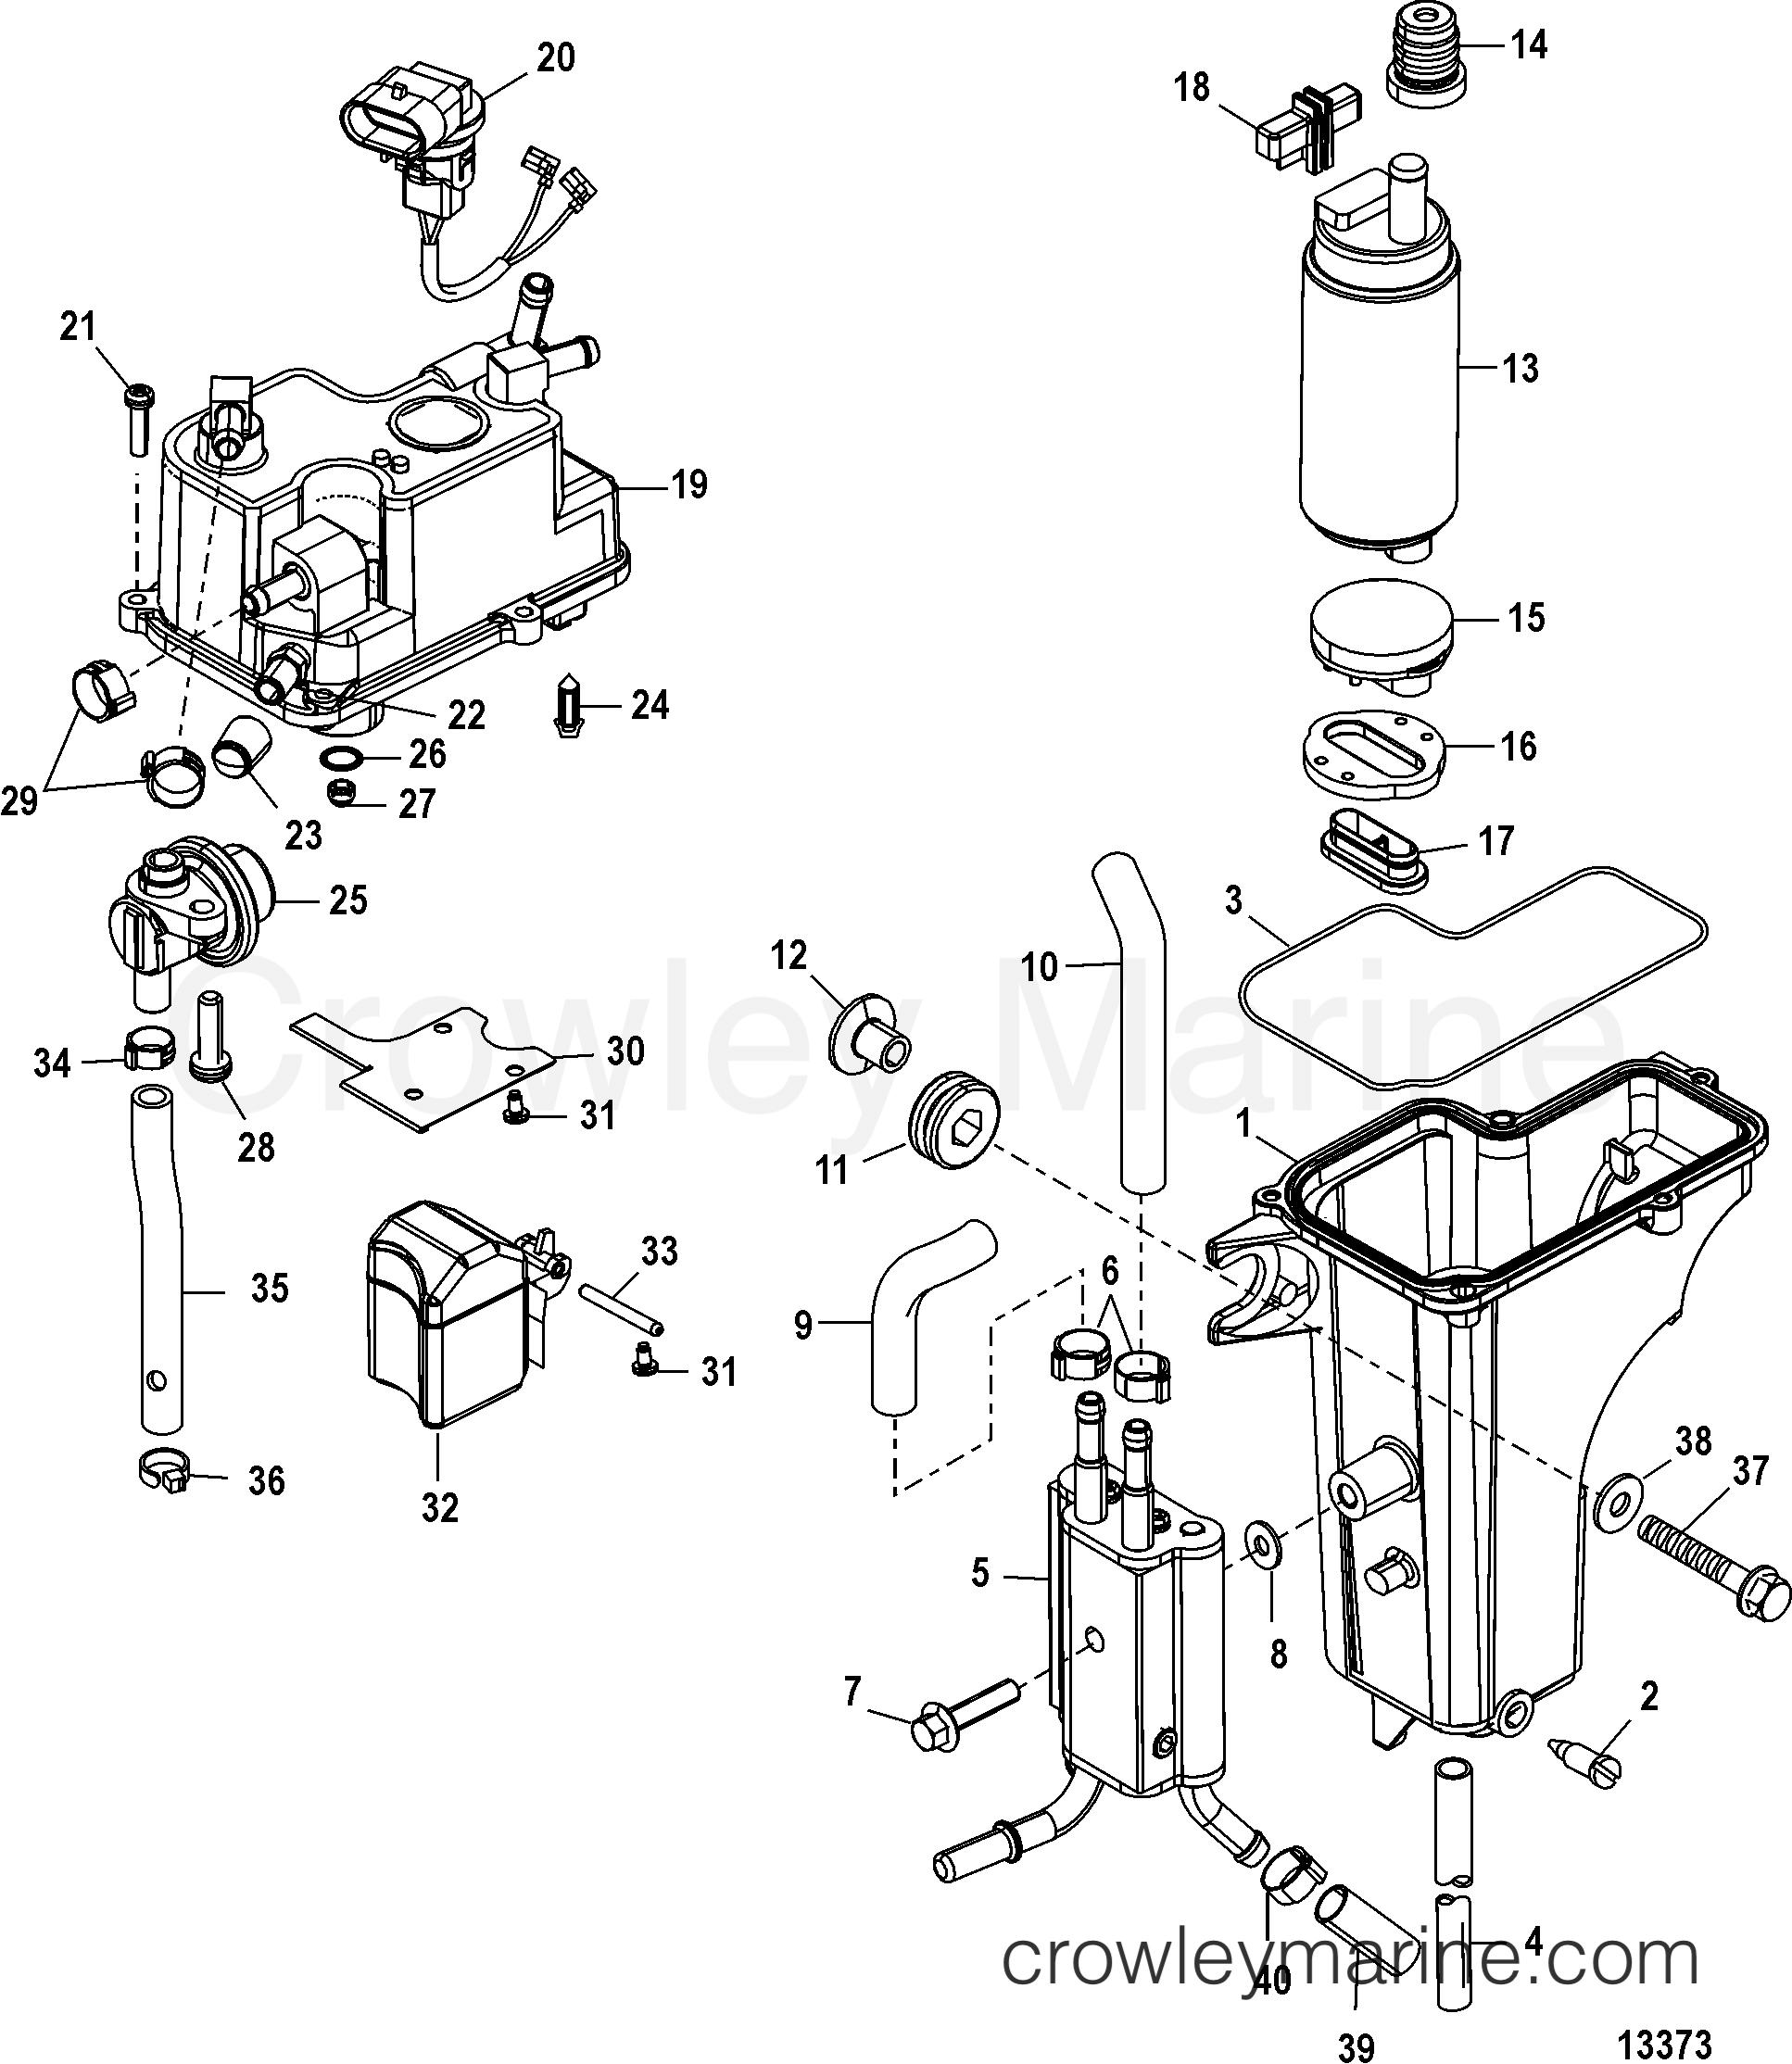 Serial Range Mariner Outboard 40 EFI (4 CYL.)(4-STROKE) - 0P401000 THRU 0P515896 [BEL] - VAPOR SEPARATOR section